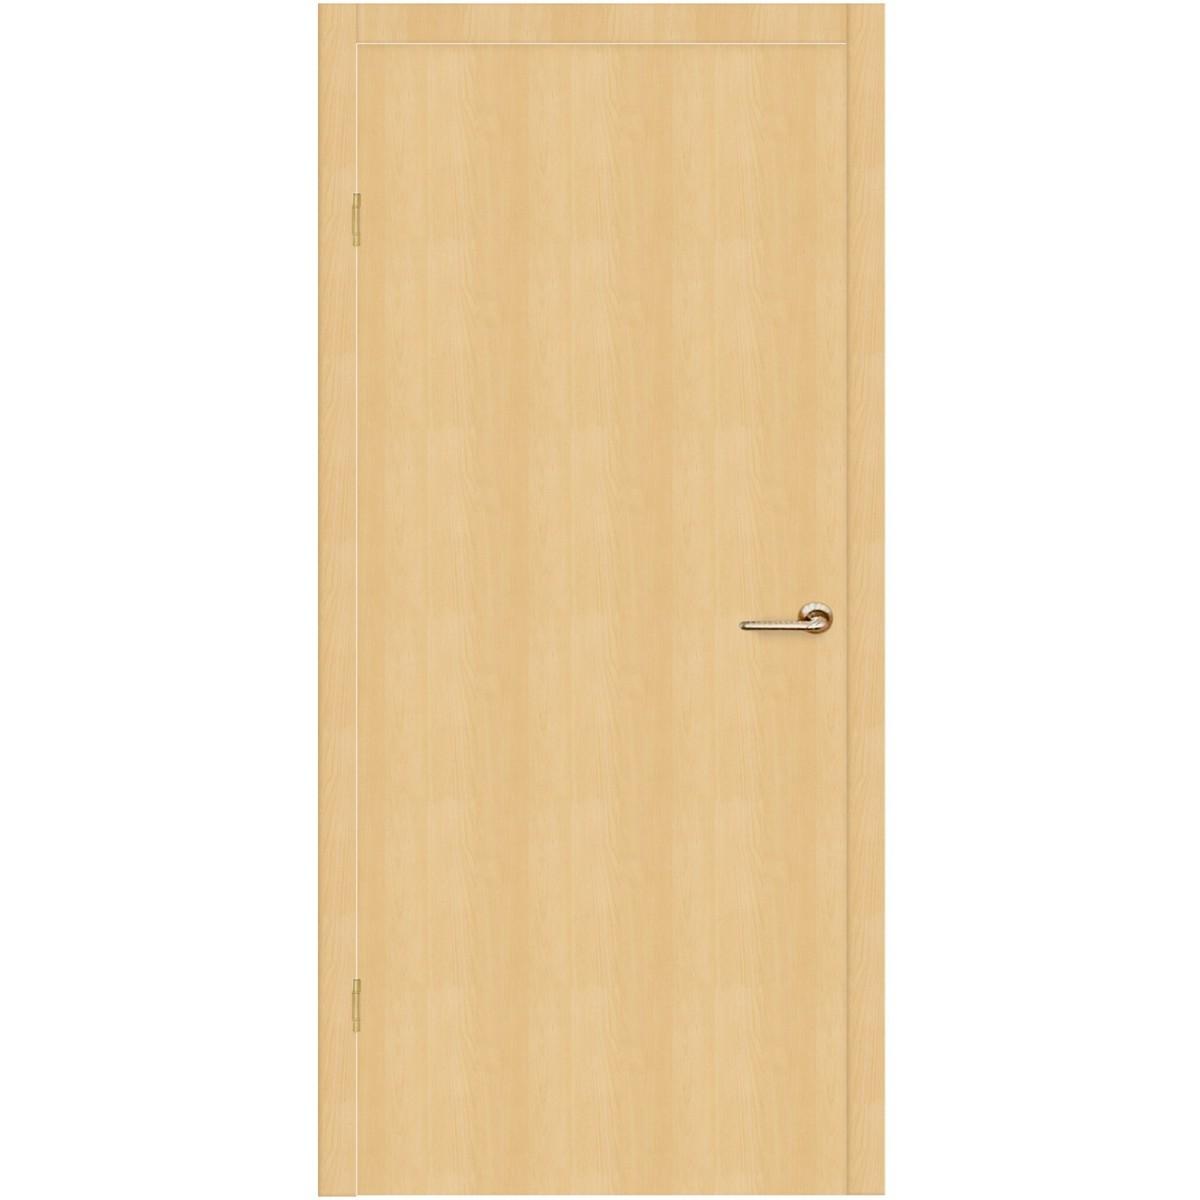 Дверь межкомнатная глухая Belleza 70x200 см ламинация цвет дуб белый